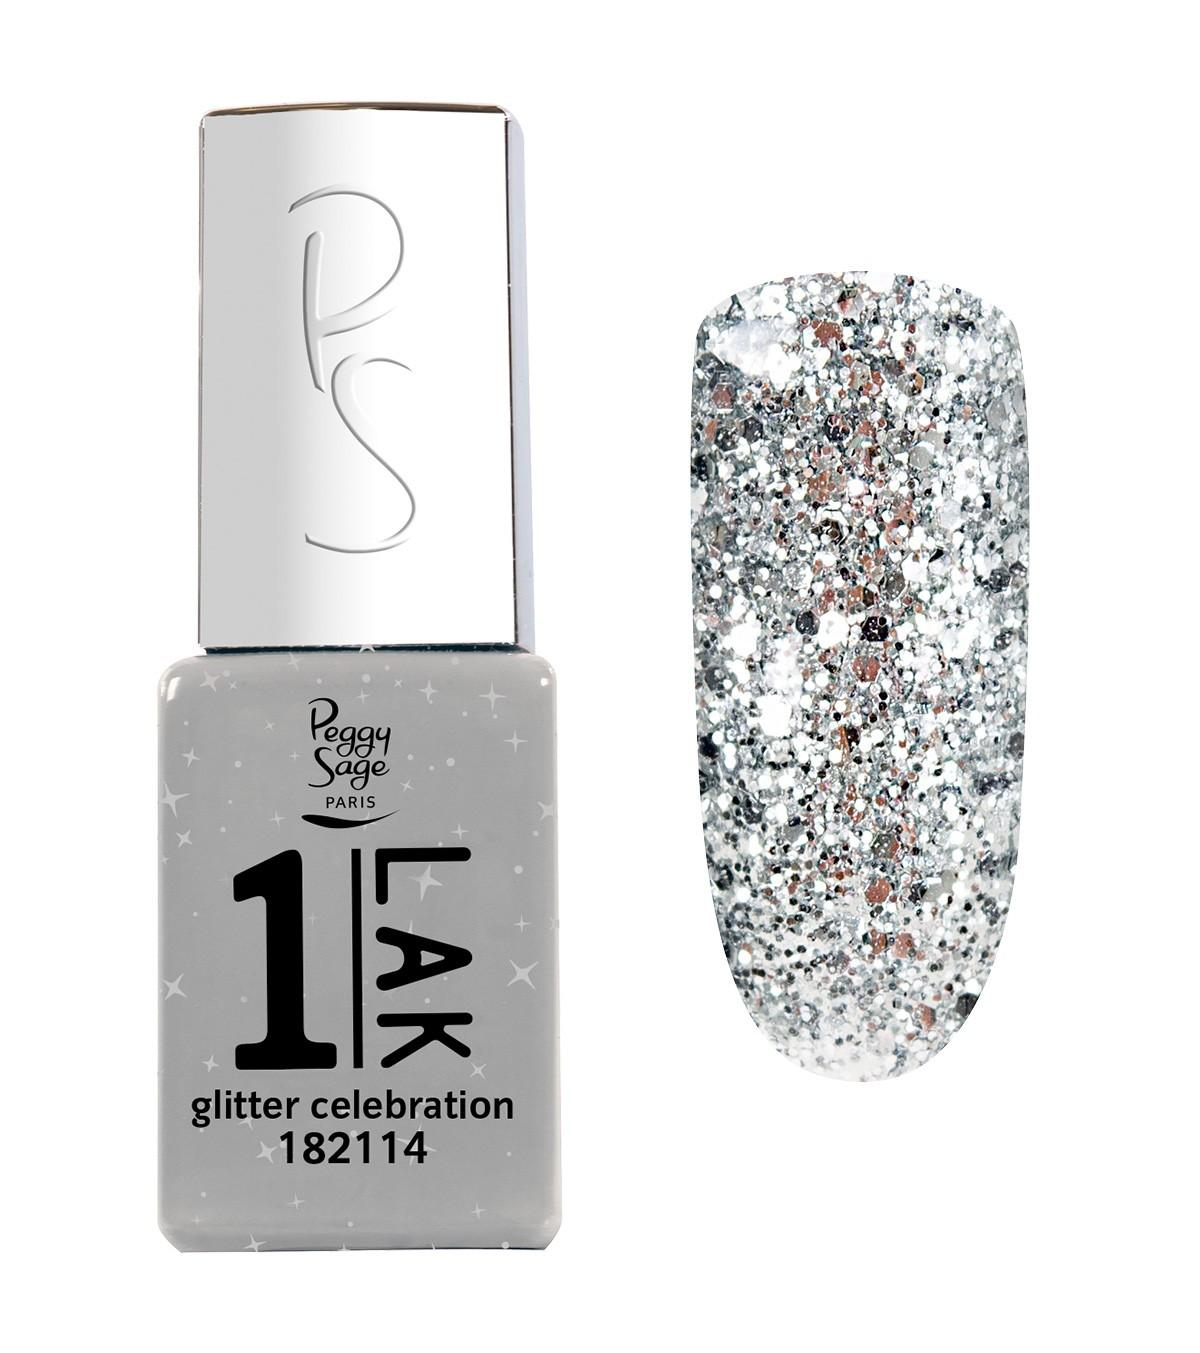 1-LAK Glitter celebration